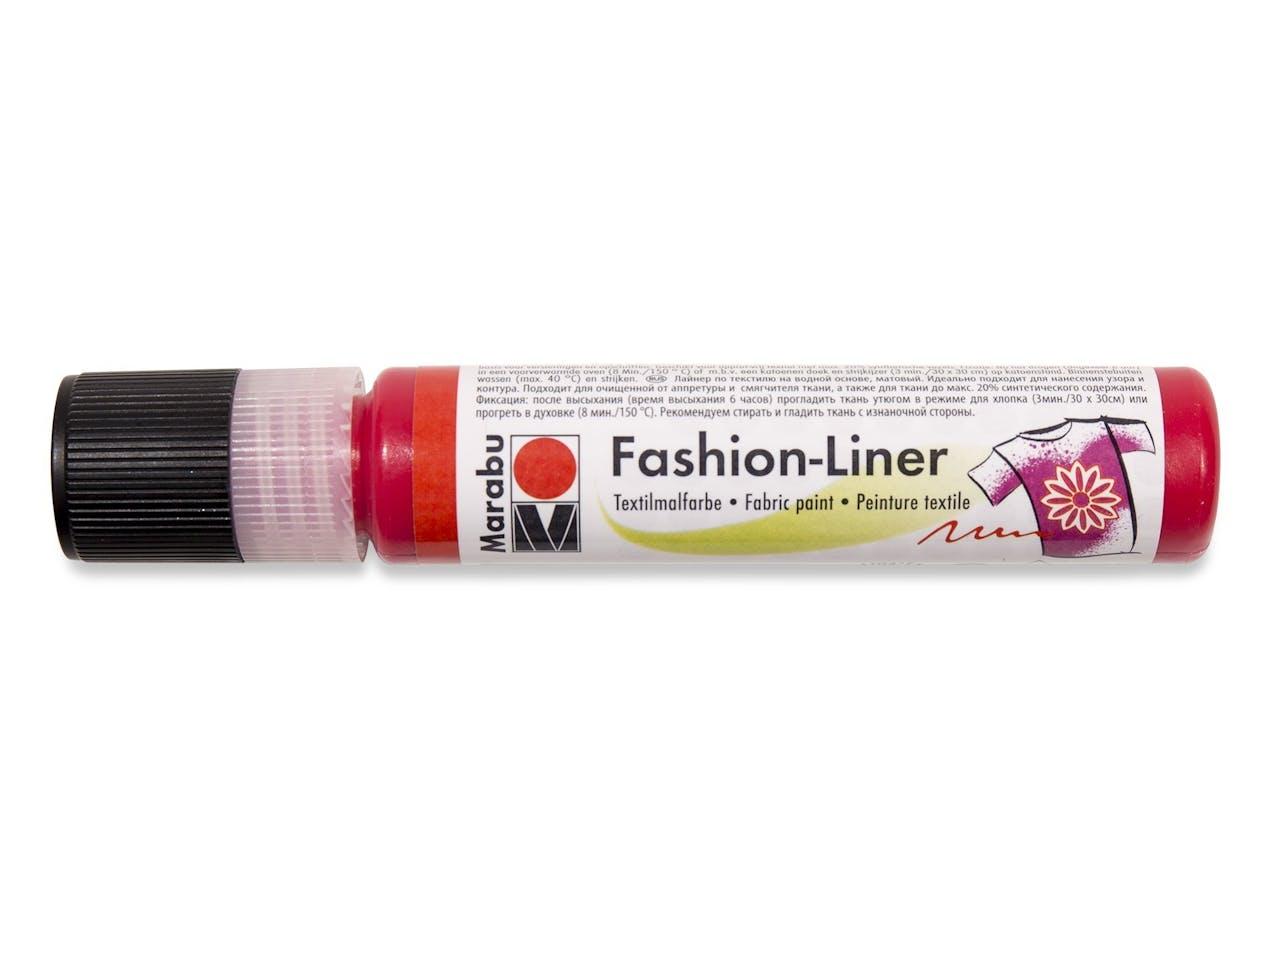 Marabu Fashion-Liner Textilmalfarbe, Tube, 25 ml, rot (232)